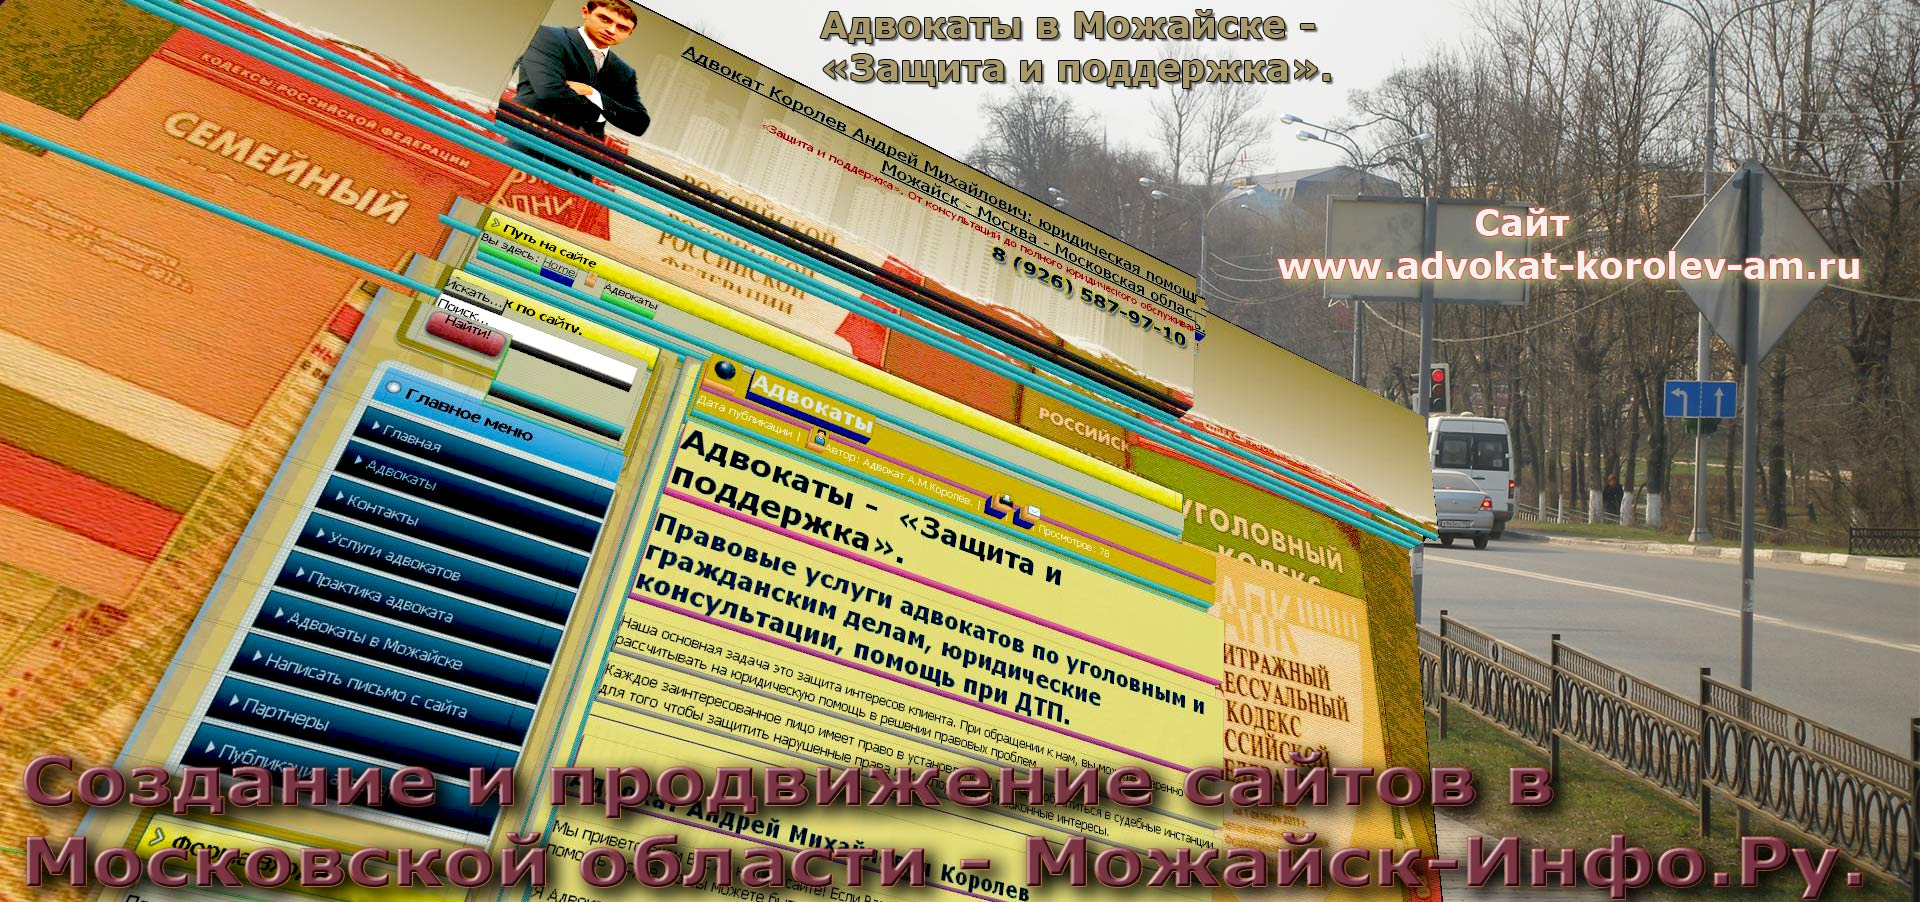 адвокат королев москва